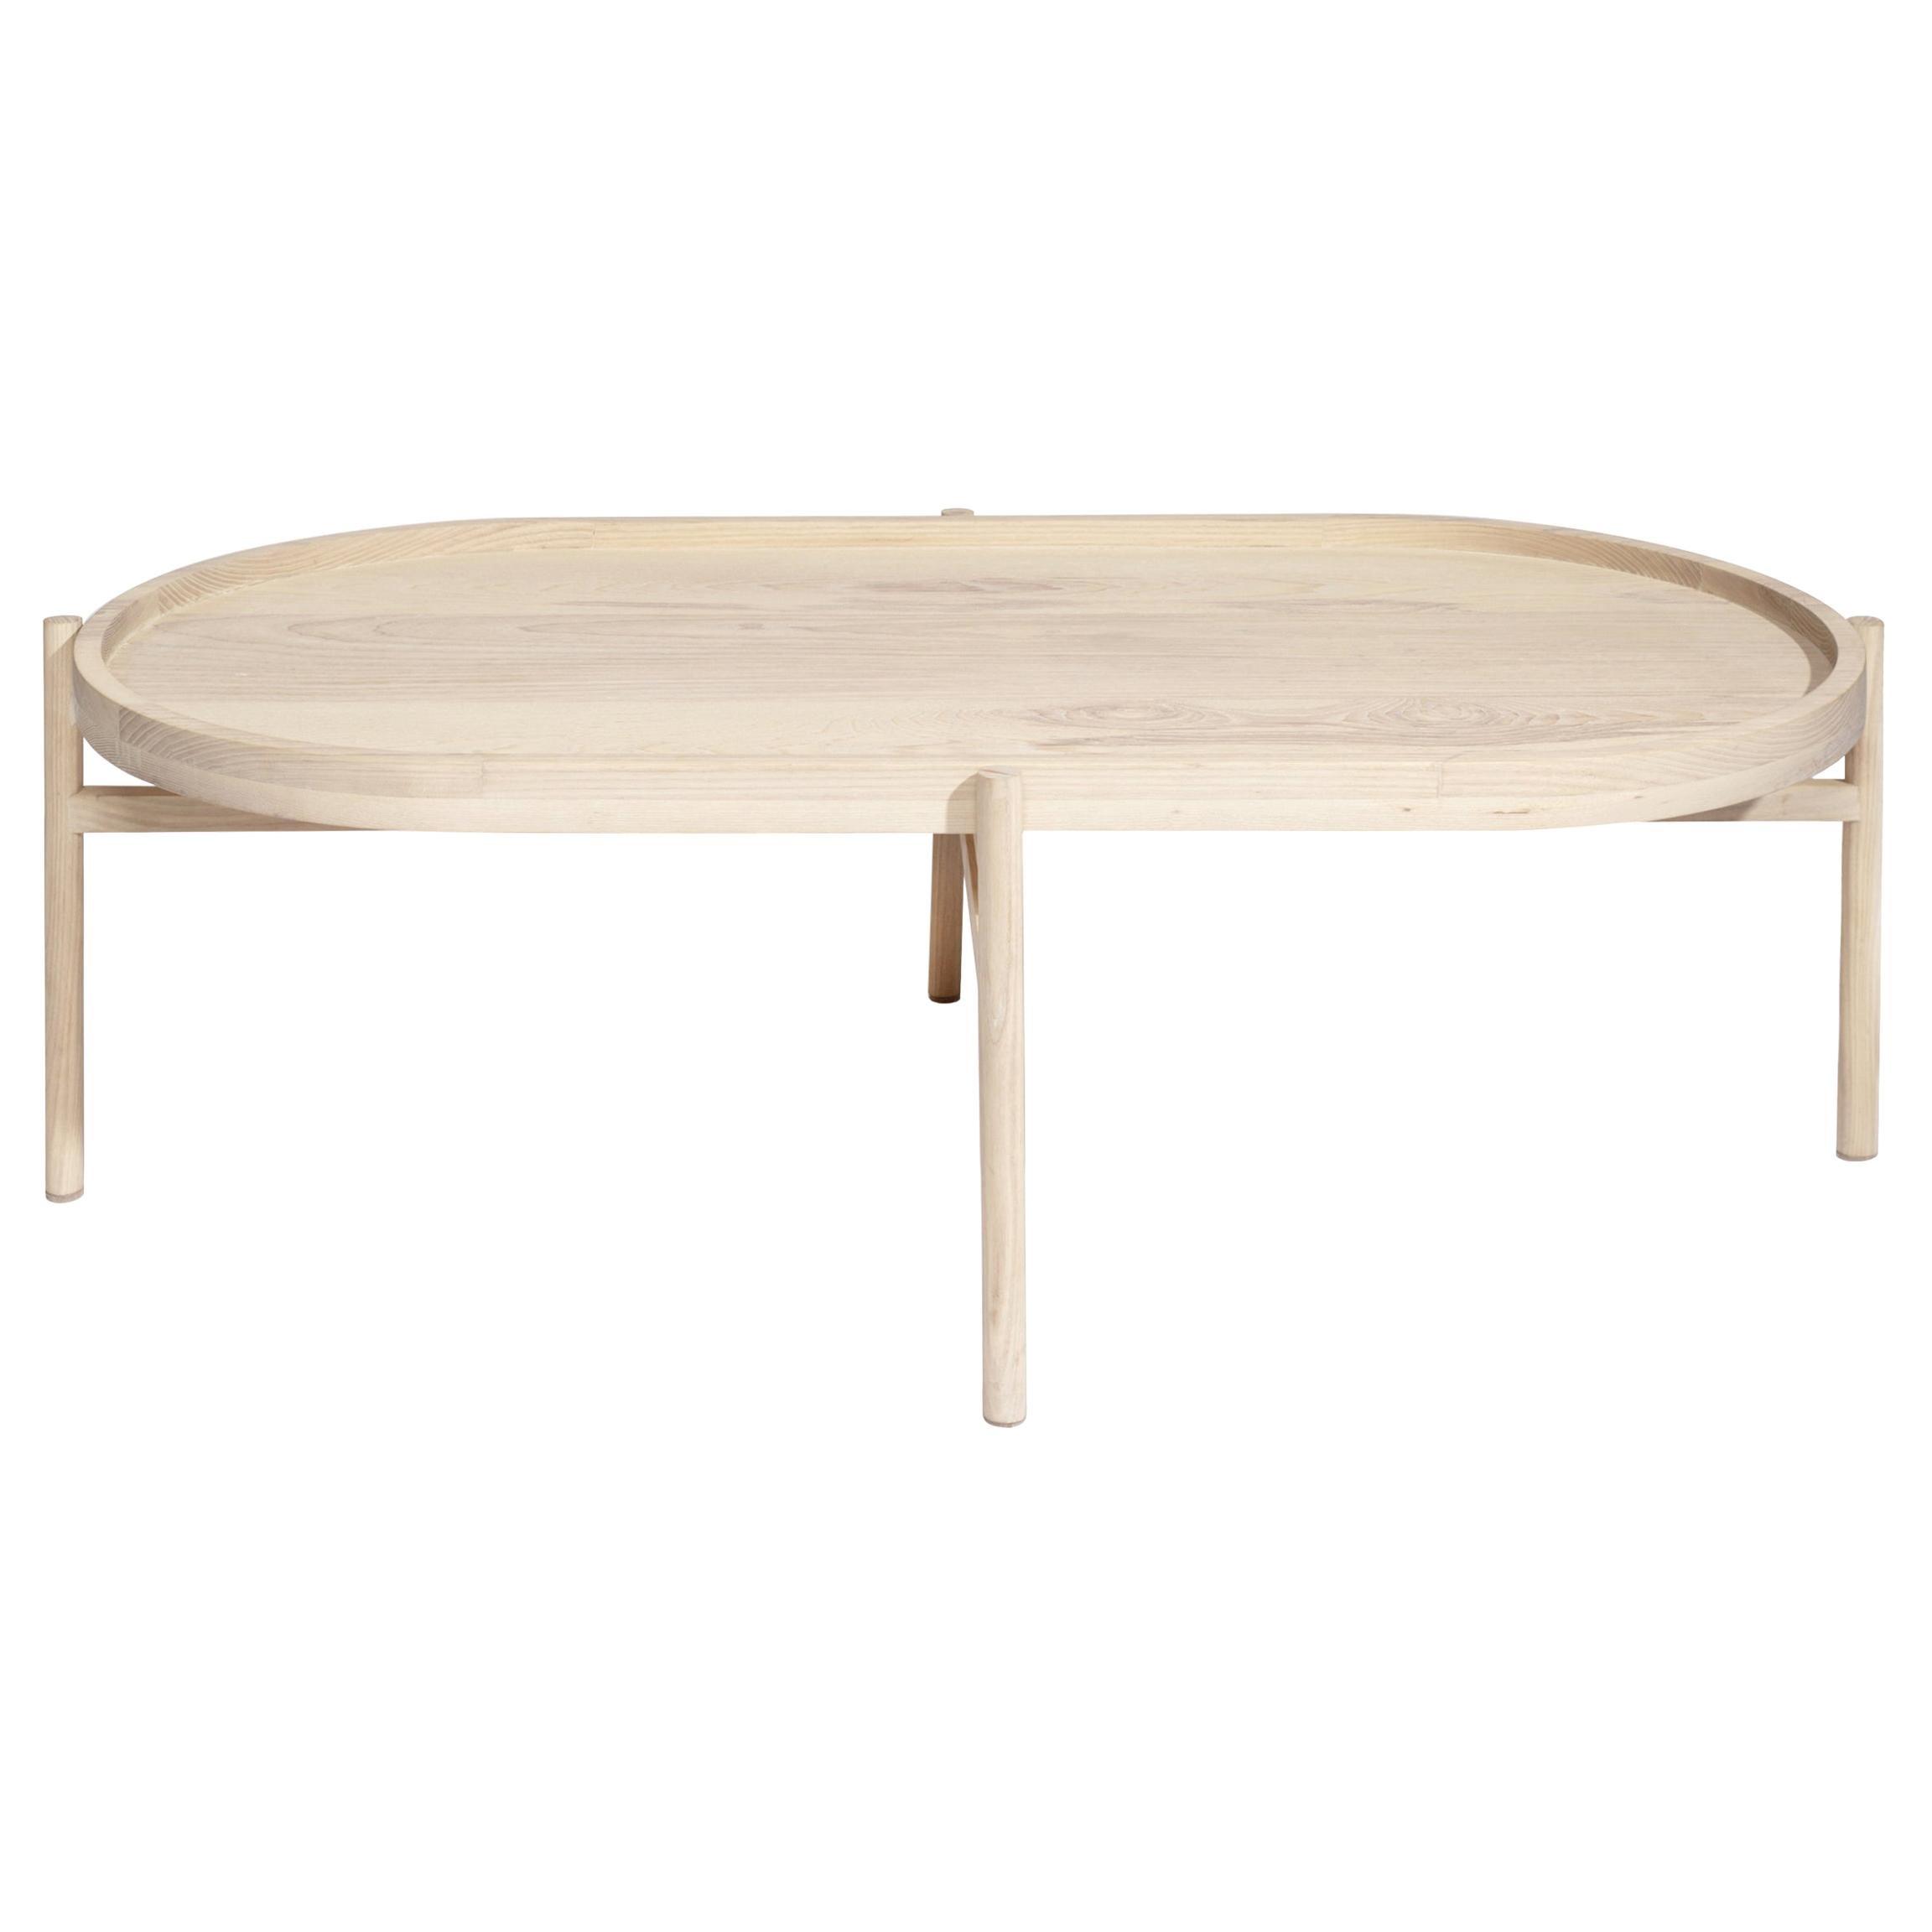 Mar solid ash wood Coffee Table